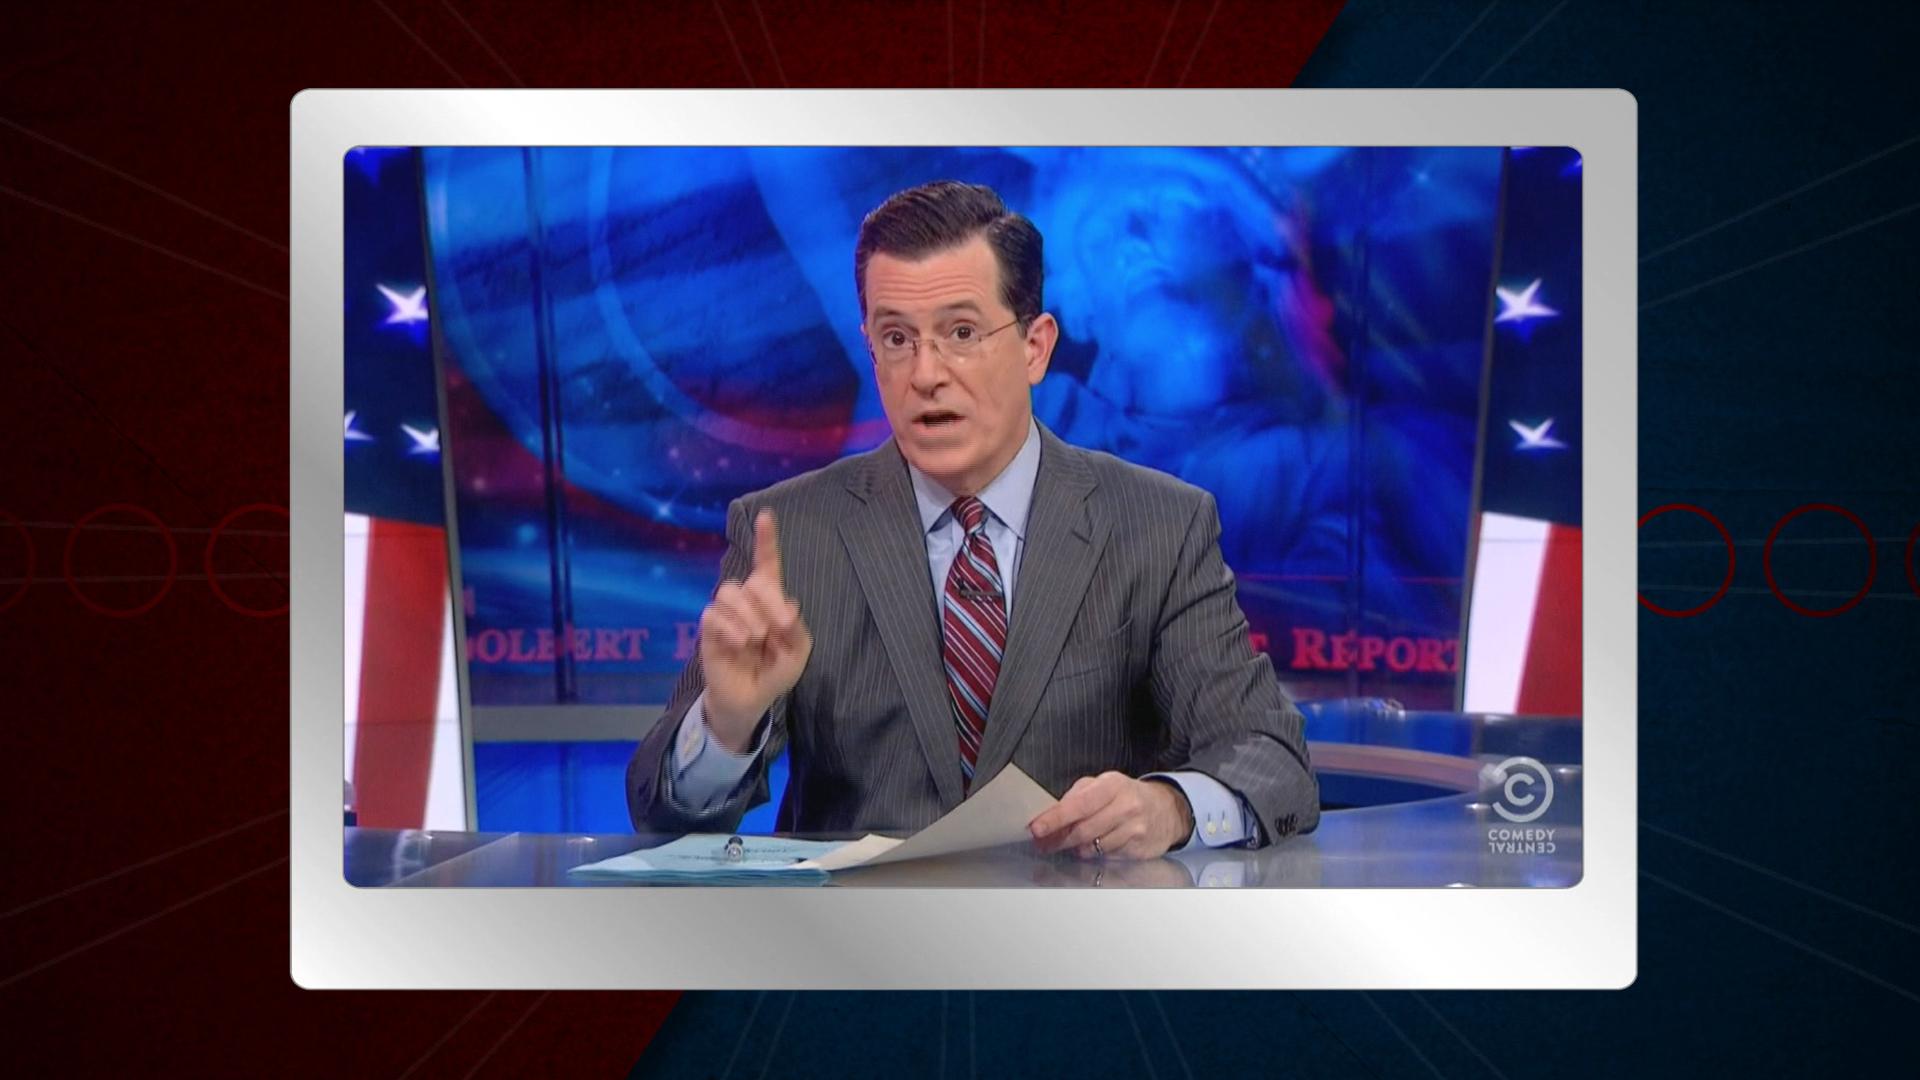 Colbert's take on Christie vs. Wildstein